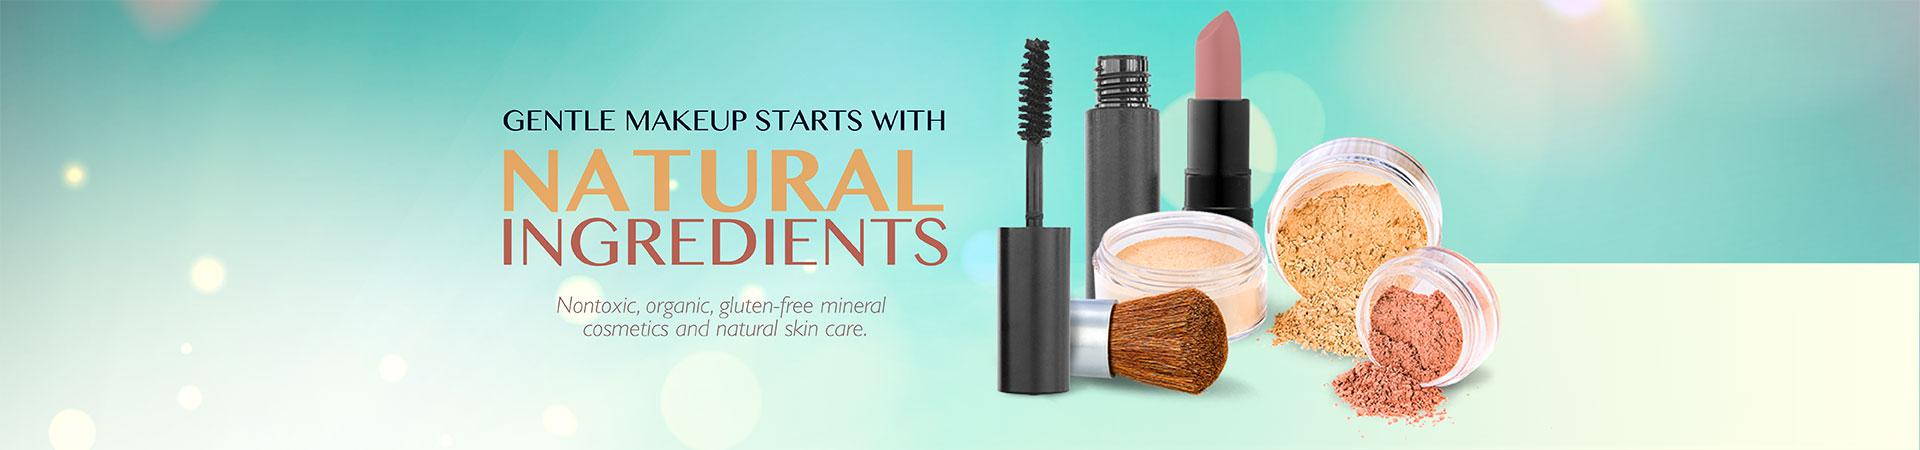 safe makeup ingredients